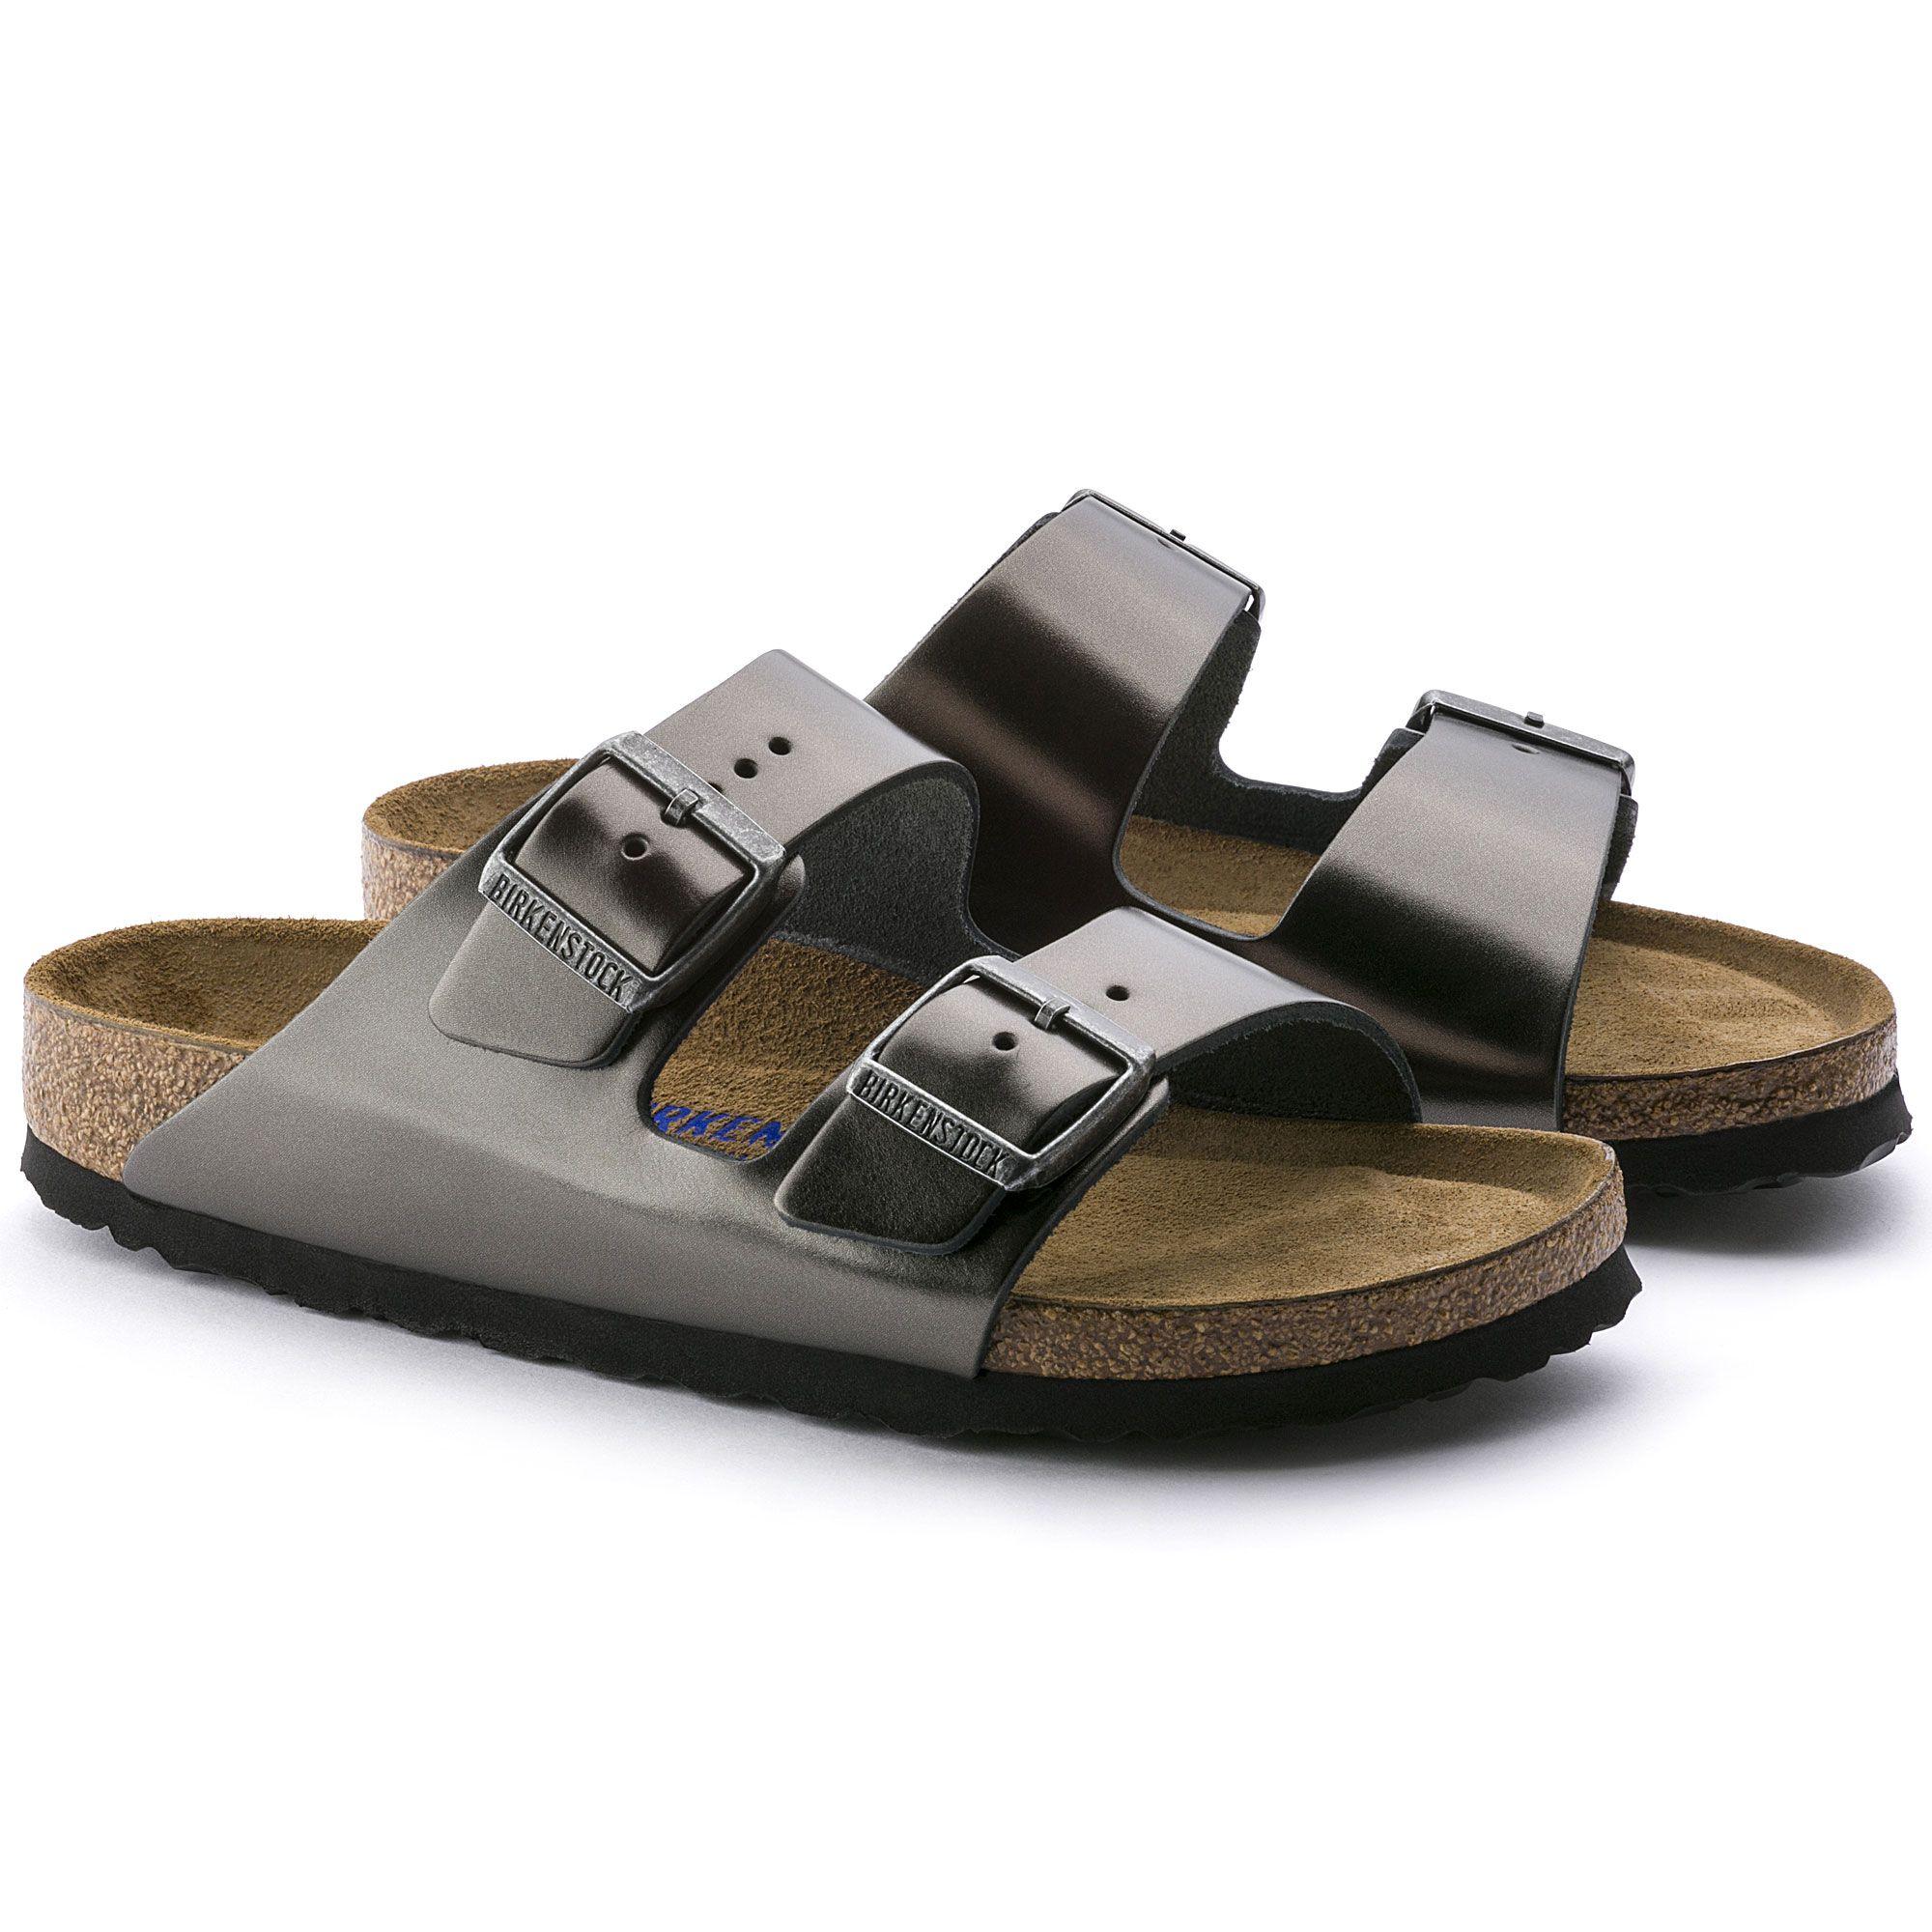 c80c3870ed433d Birkenstock Arizona Soft Footbed Sandal - Women s Metallic Anthracite  Leather 36